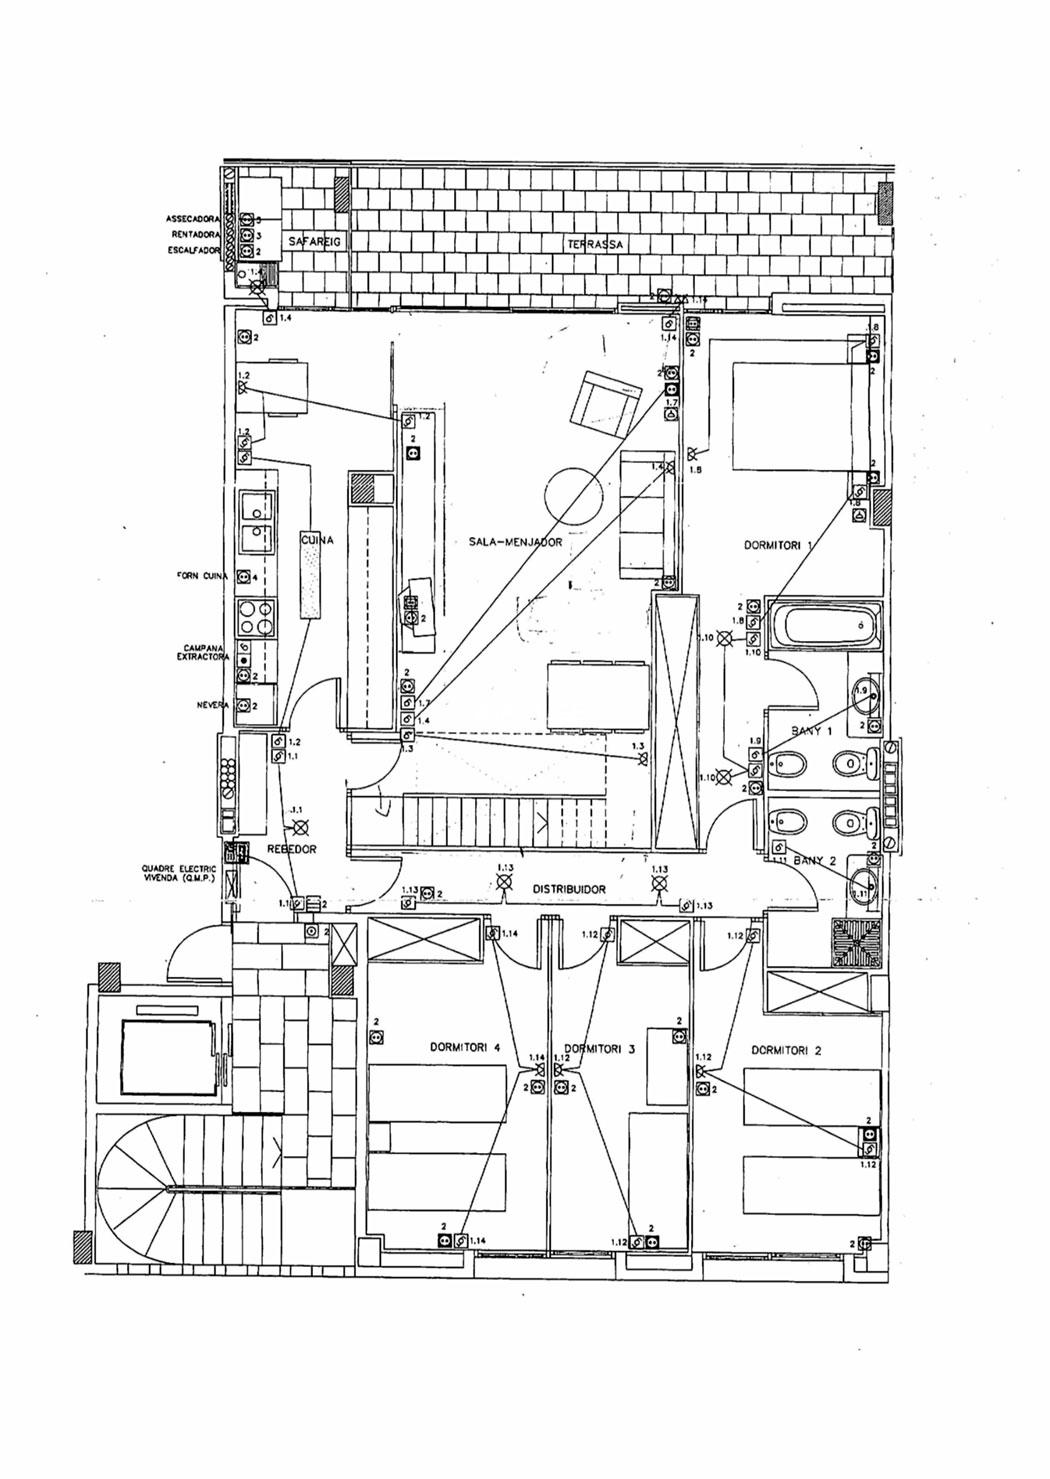 Sant Cugat - Torre Blanca Ático Dúplex